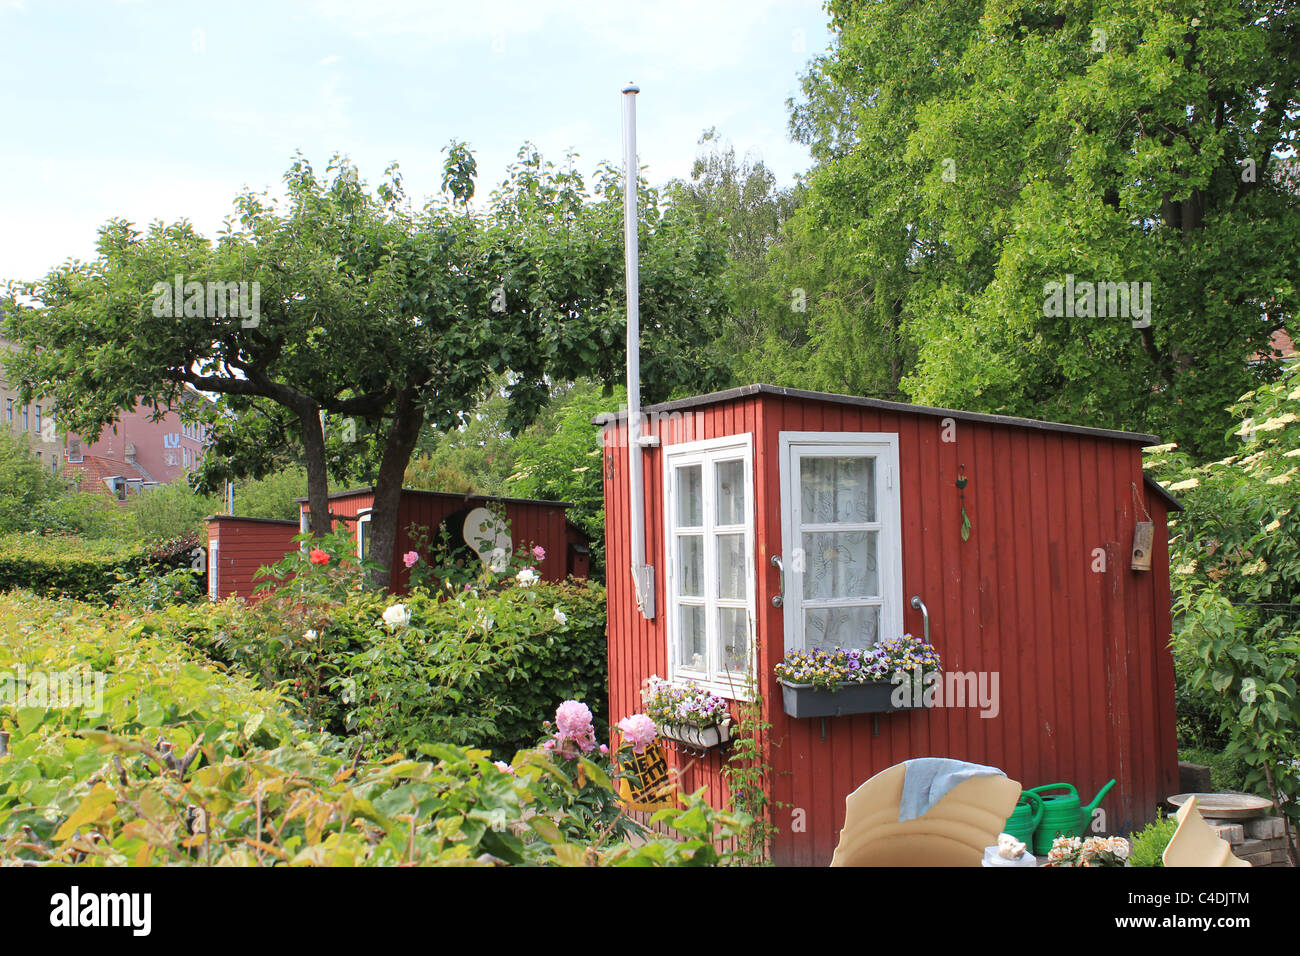 Allotment garden cottages in Copenhagen - Stock Image